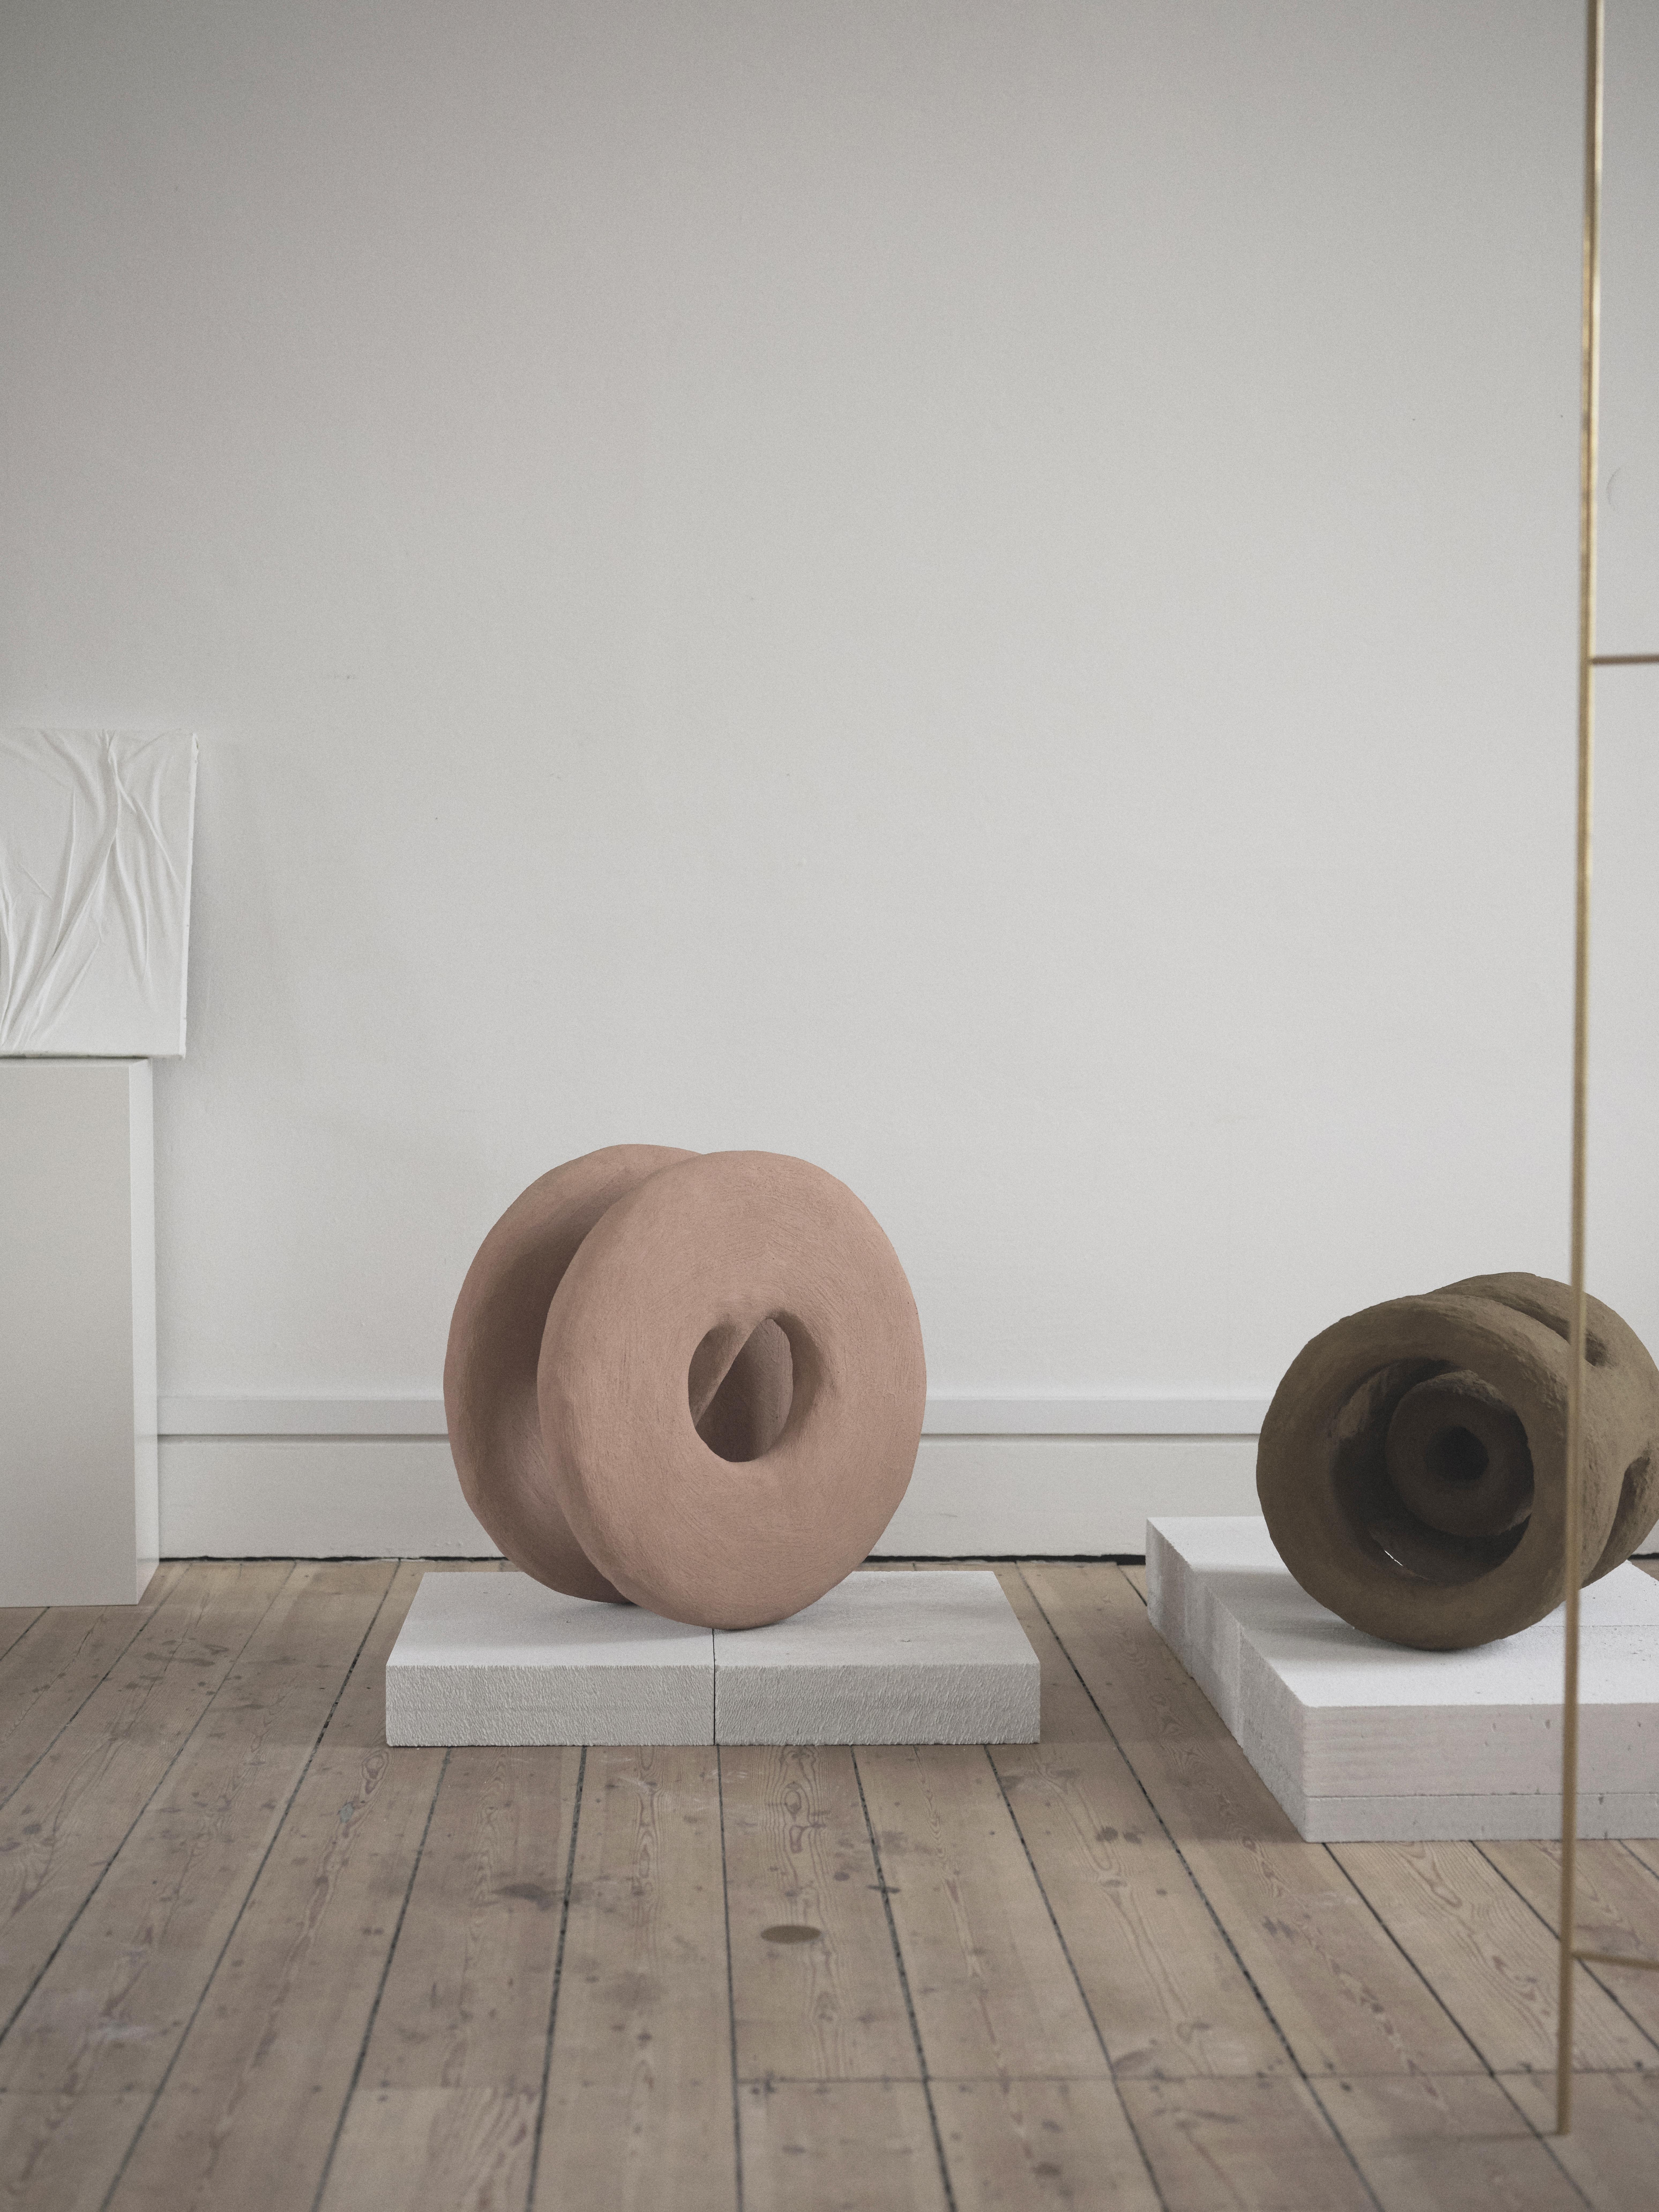 3daysofdesign exhibition at the Hotel Charlottenborg, Copenhagen